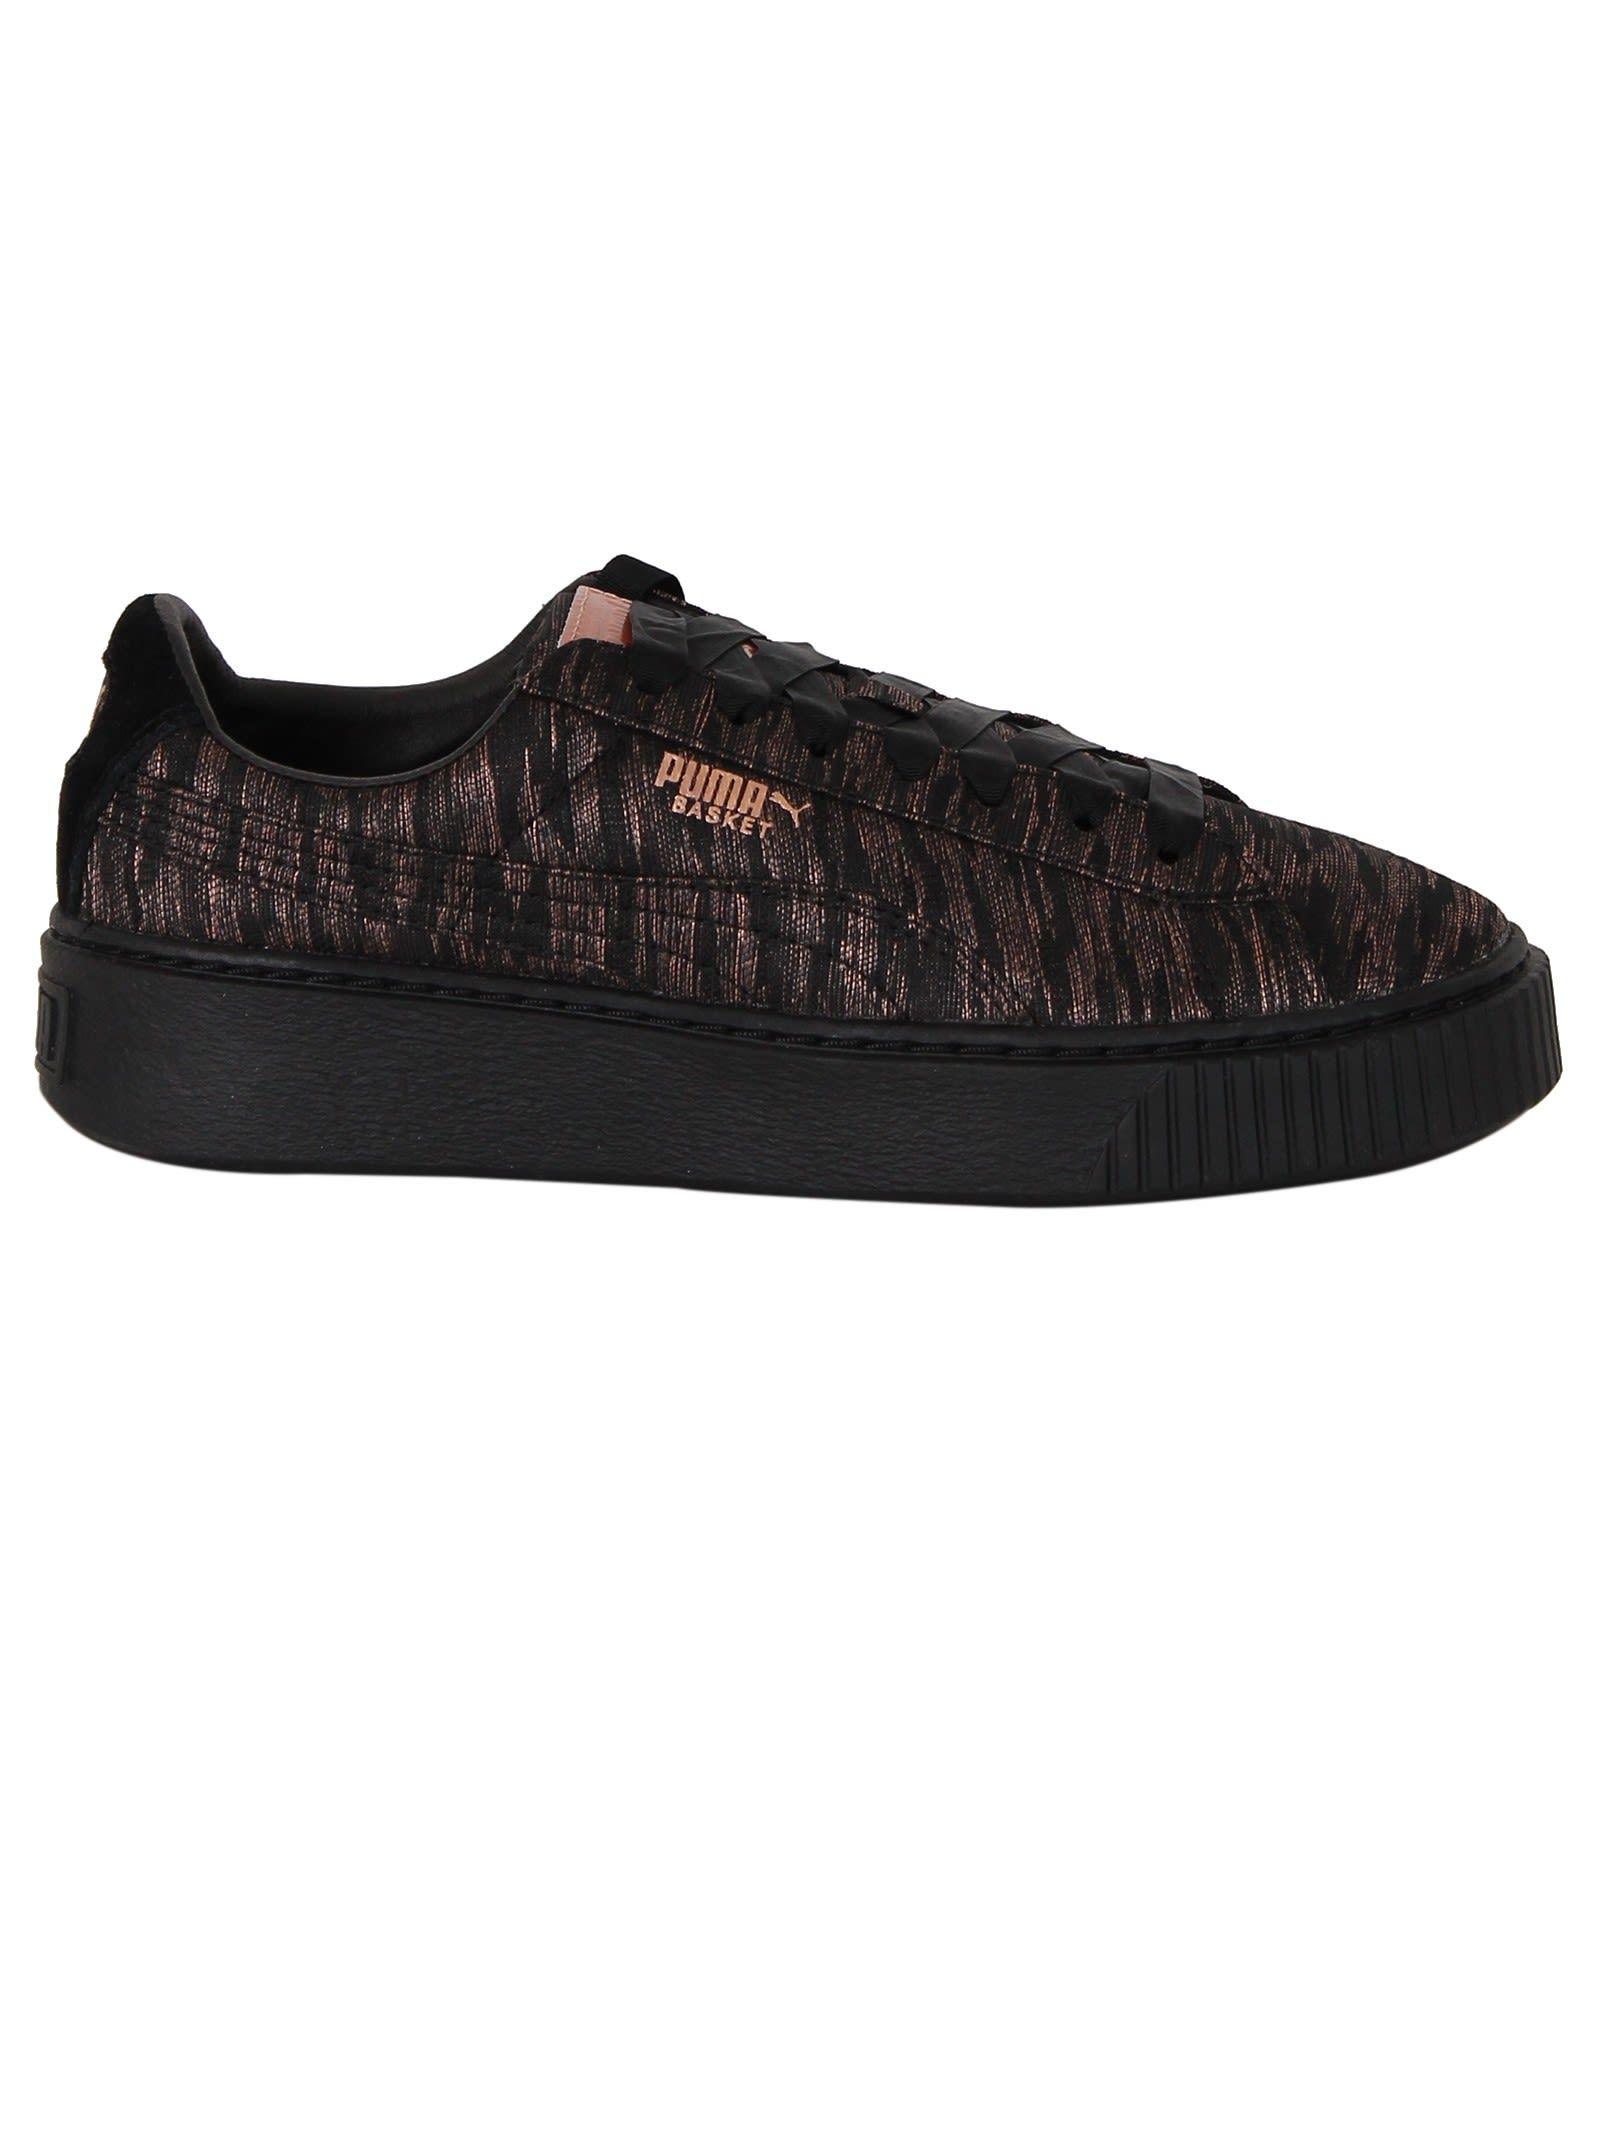 lowest price f94a3 f1494 PUMA   Puma Puma Black Basket Platform Vr Sneakers  Shoes  Sneakers  PUMA